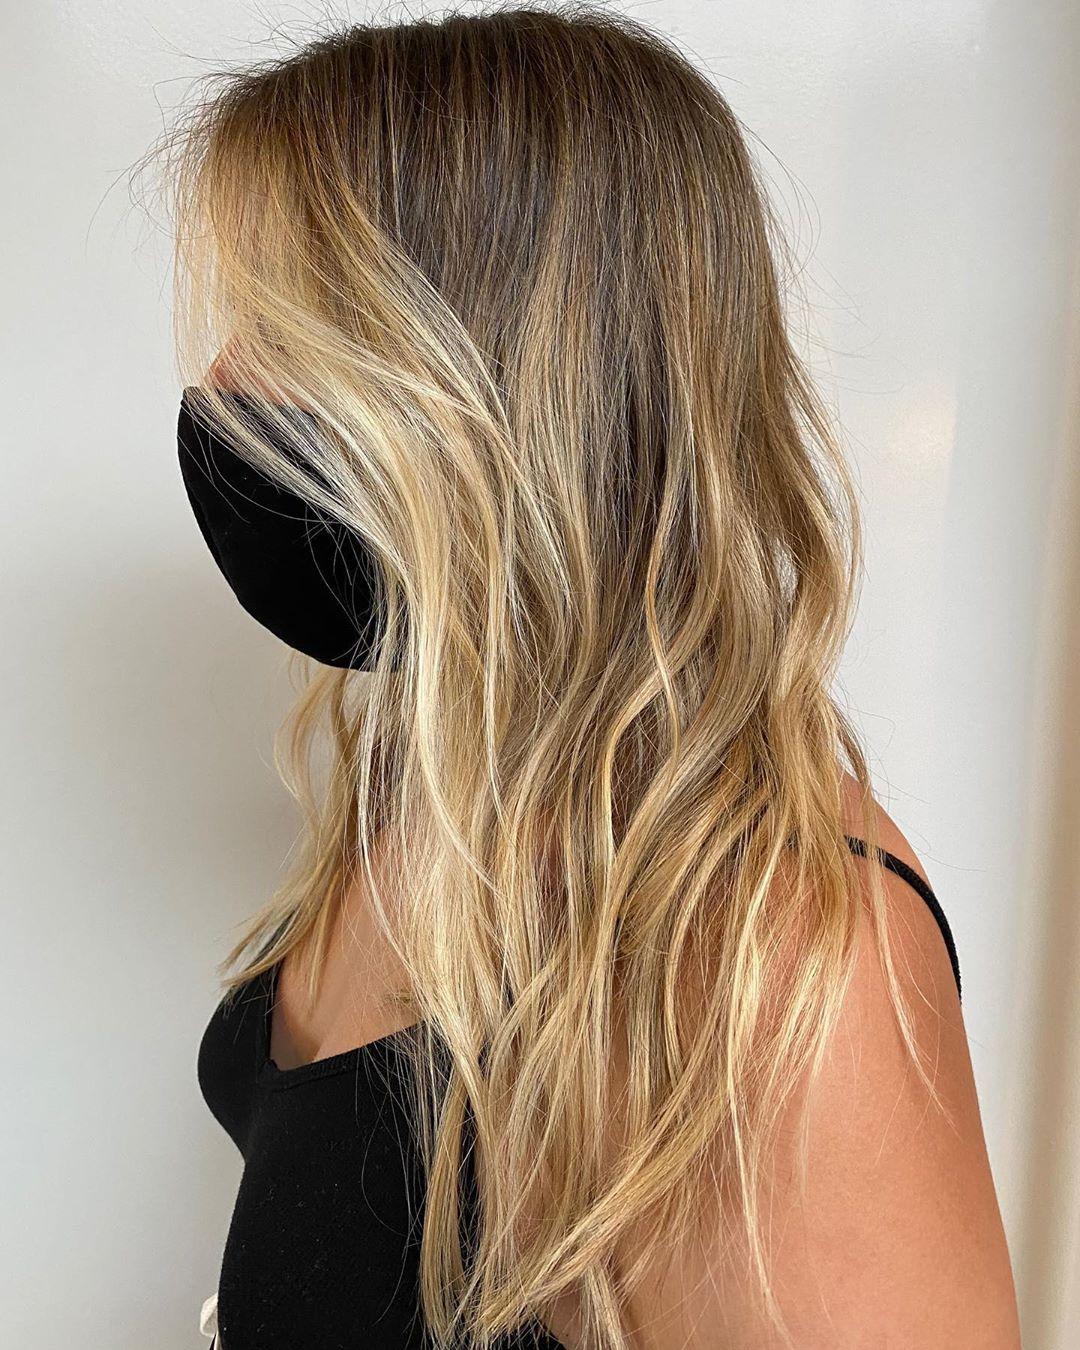 "JOHNNY RAMIREZ Colorist on Instagram: ""Lived in color  California beach kissed high lights. Hair color @johnnyramirez  Cut @kerrie.fishman   #livedincolor #johnnyramirez…"""